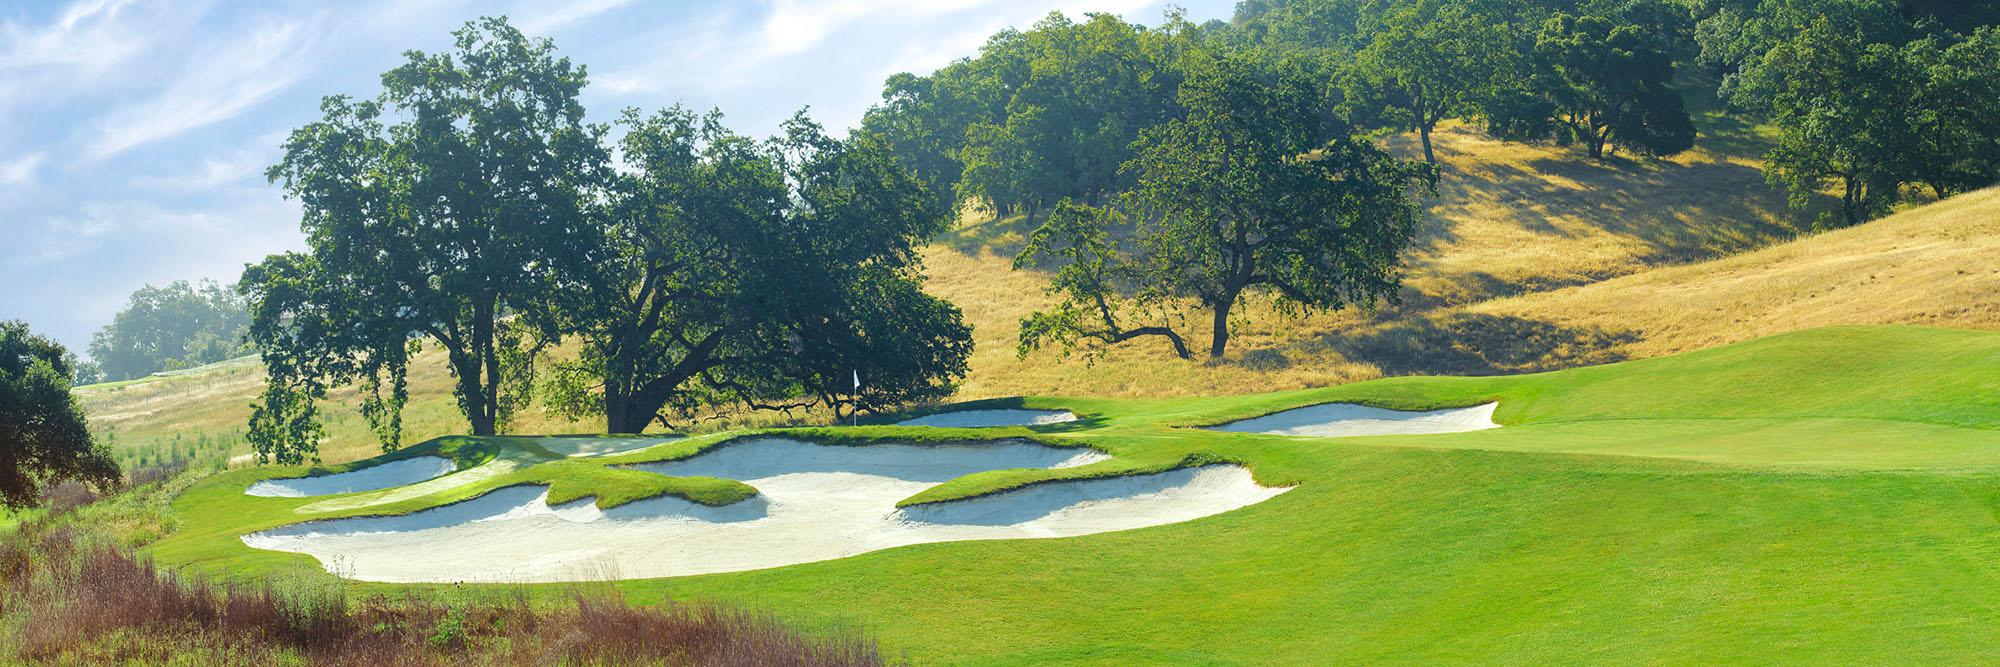 Golf Course Image - CordeValle Golf Club No. 16